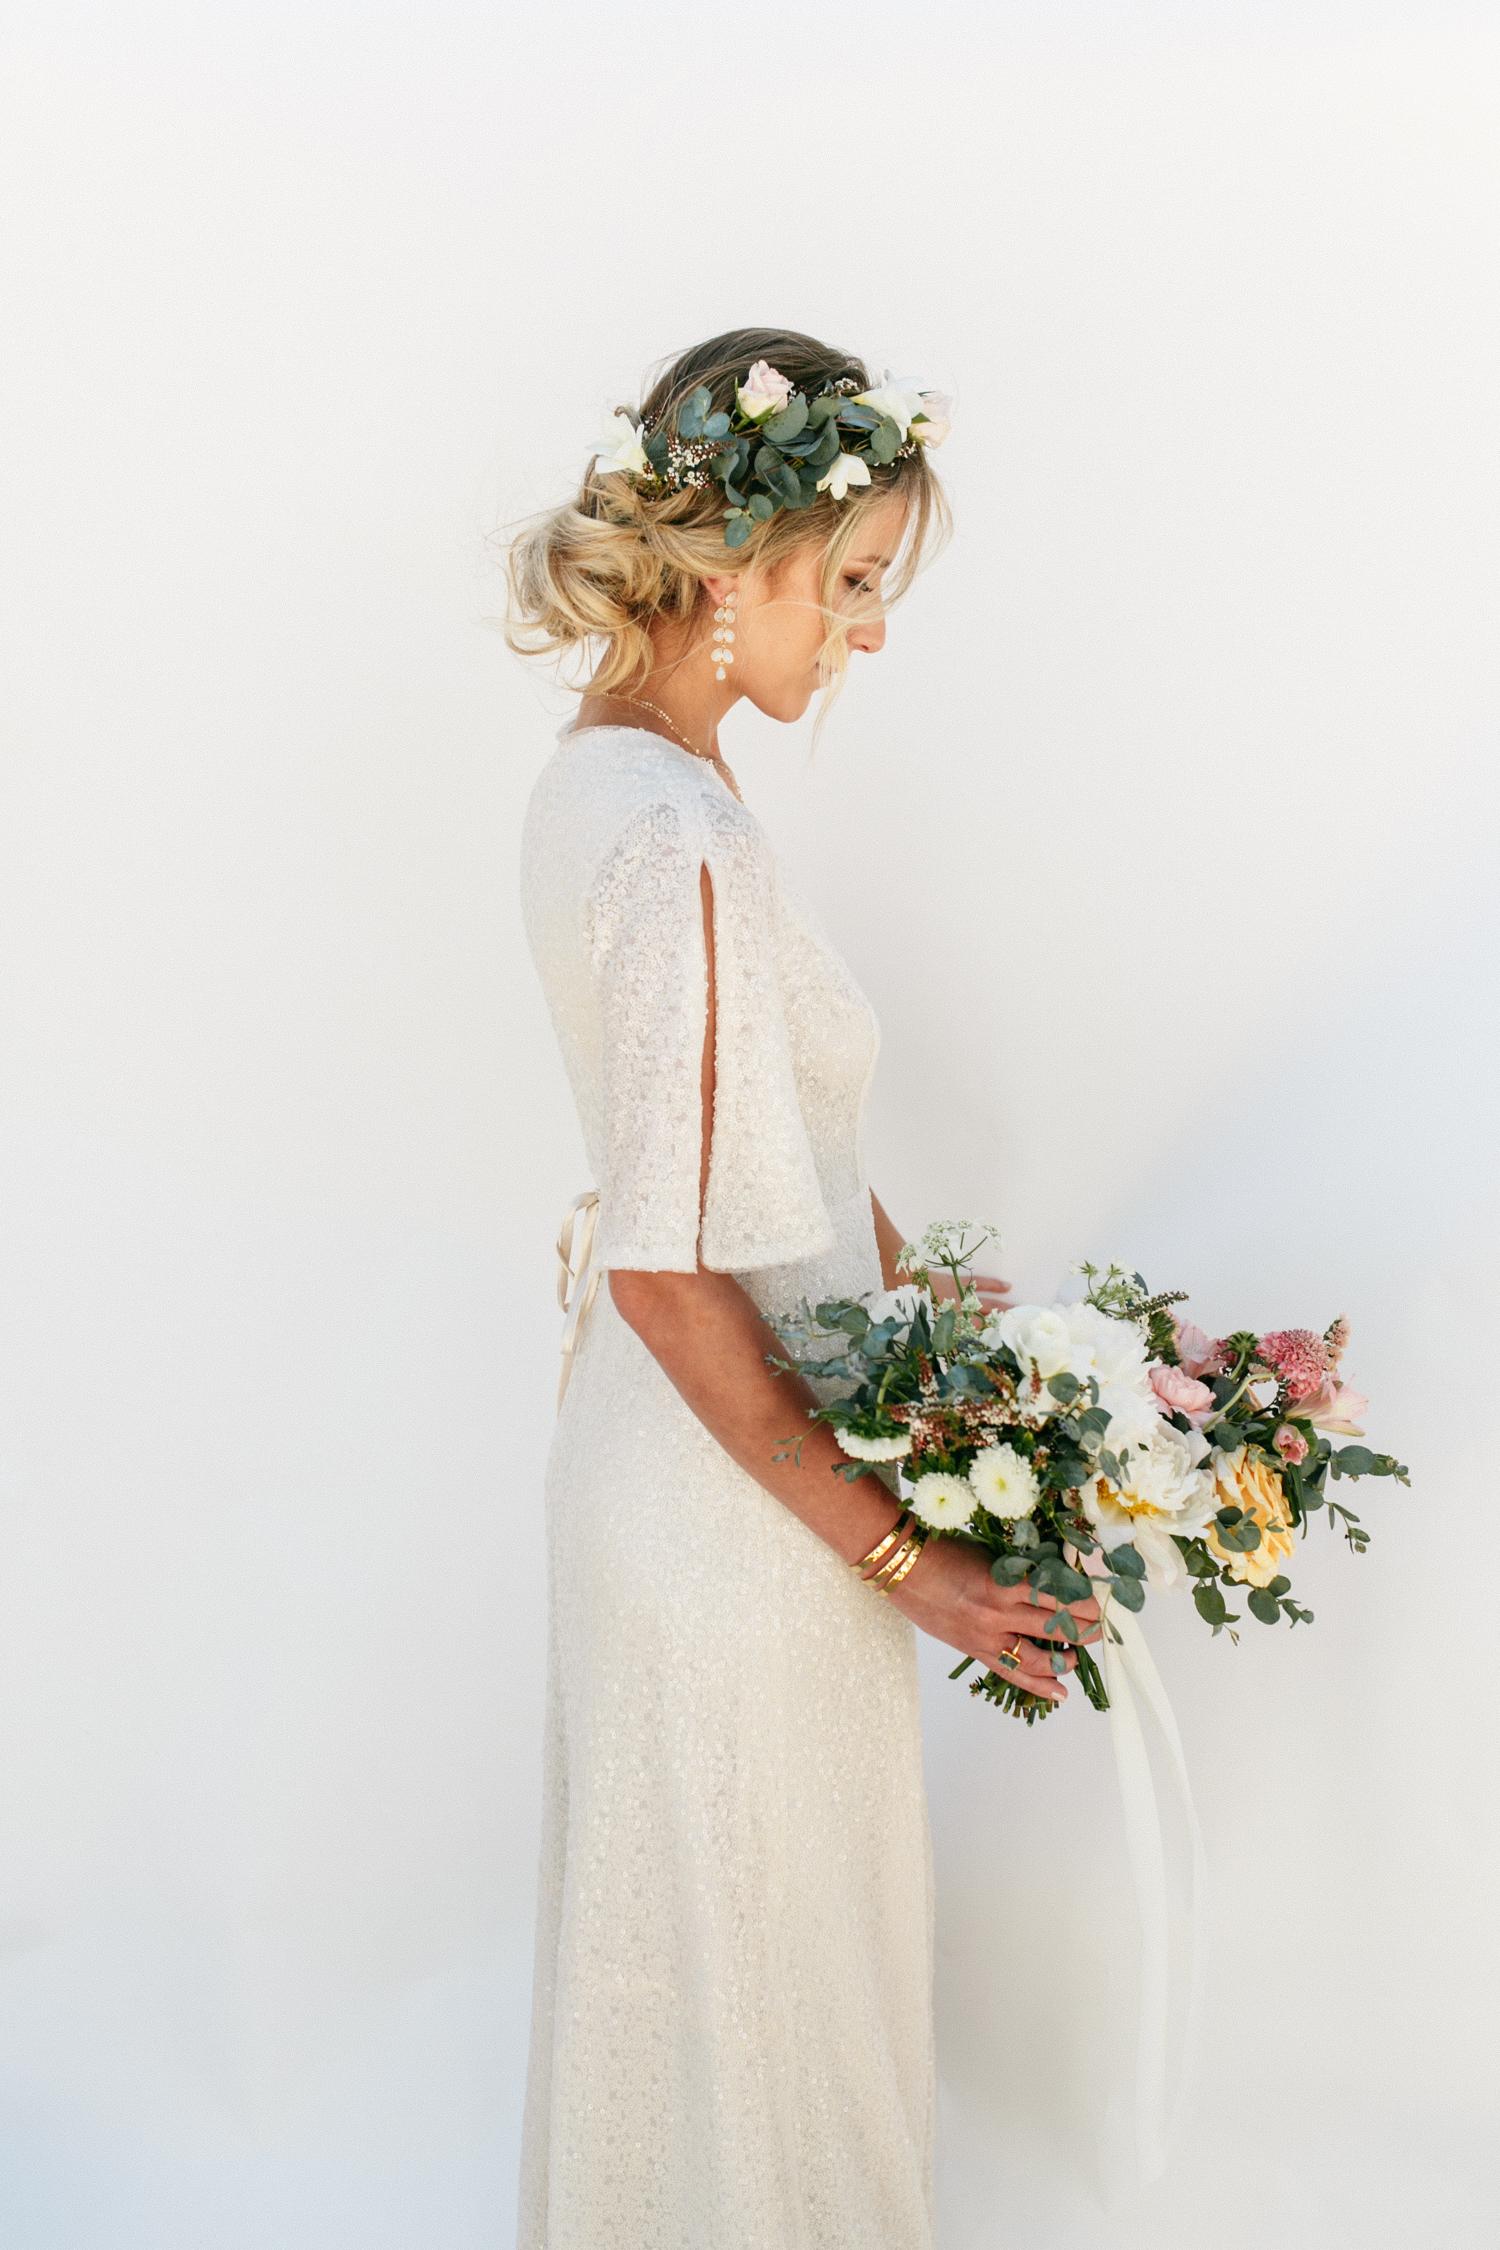 SamErica Studios - modern boho bride - minimalist wedding jewelry